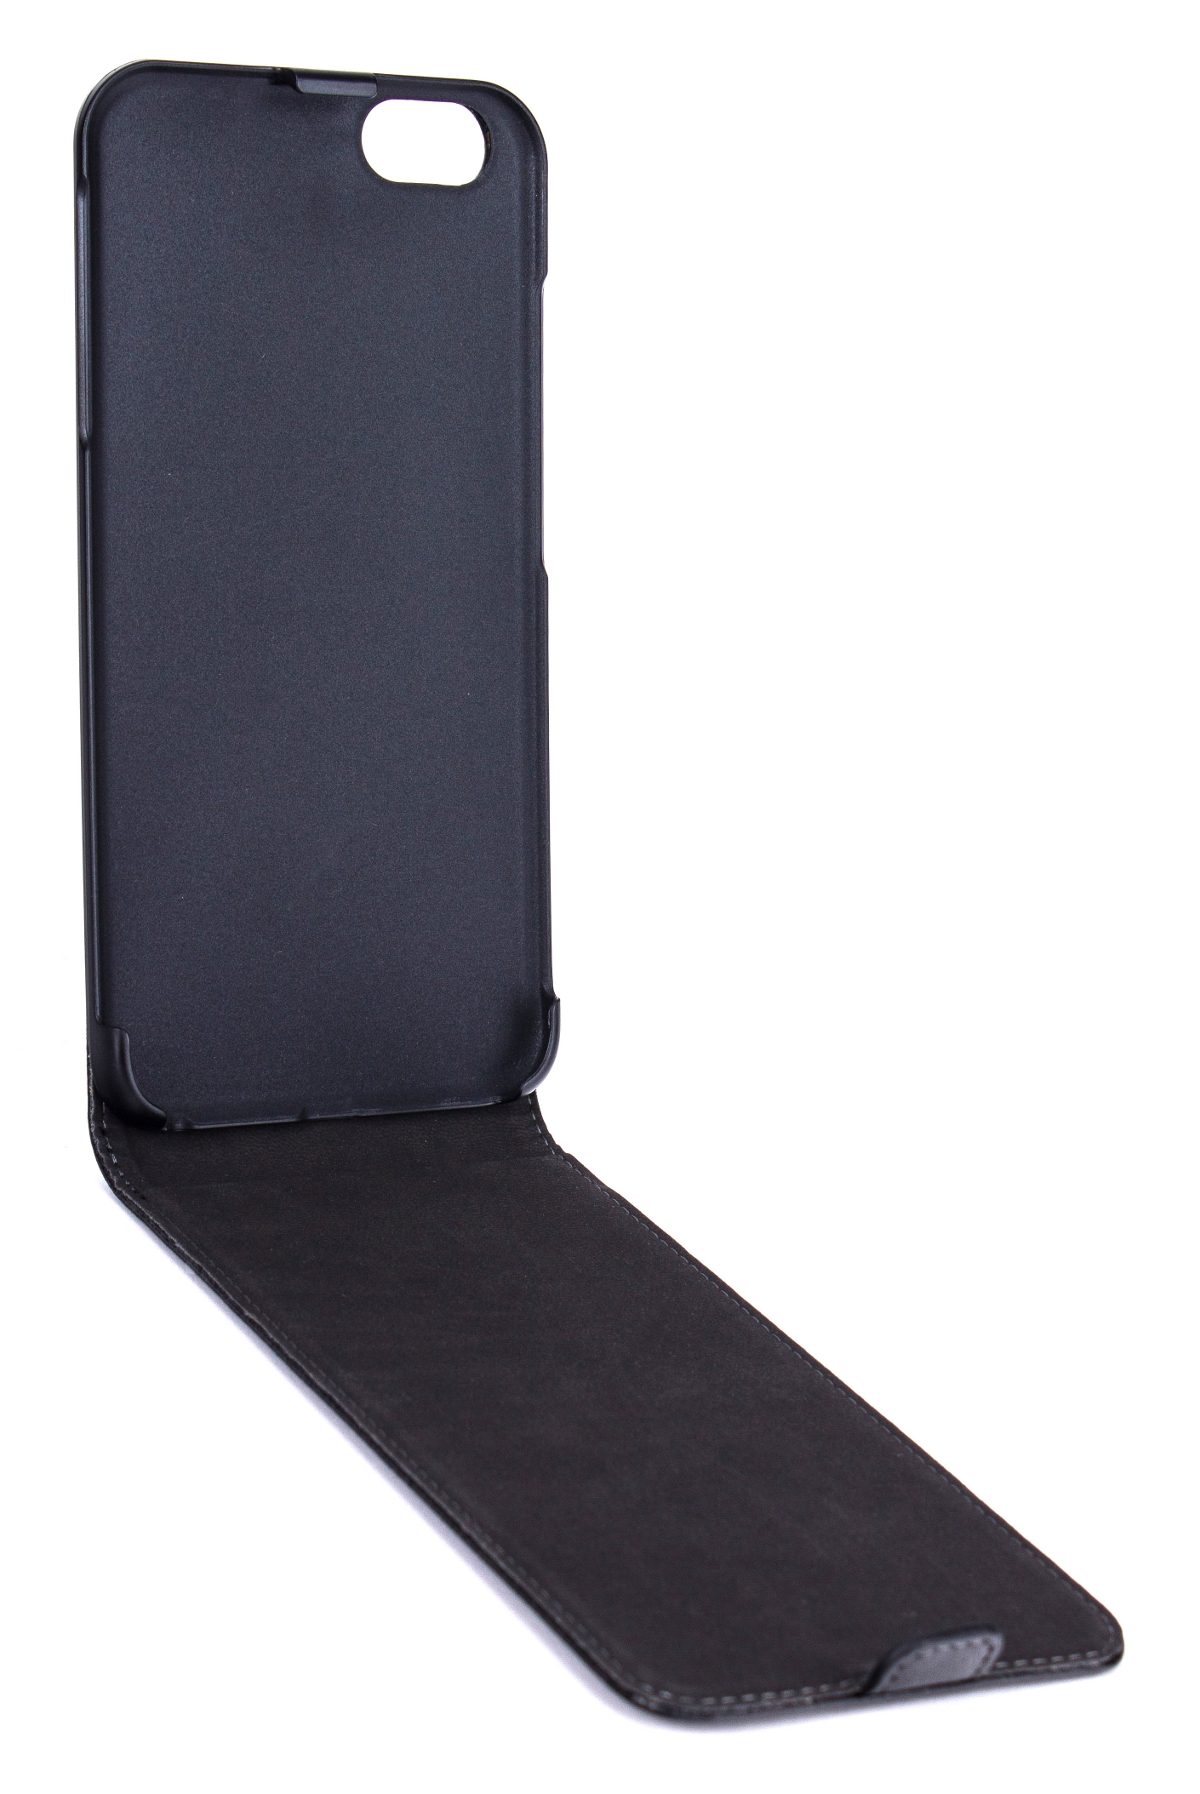 Etui flap Xqisit Iphone 4s